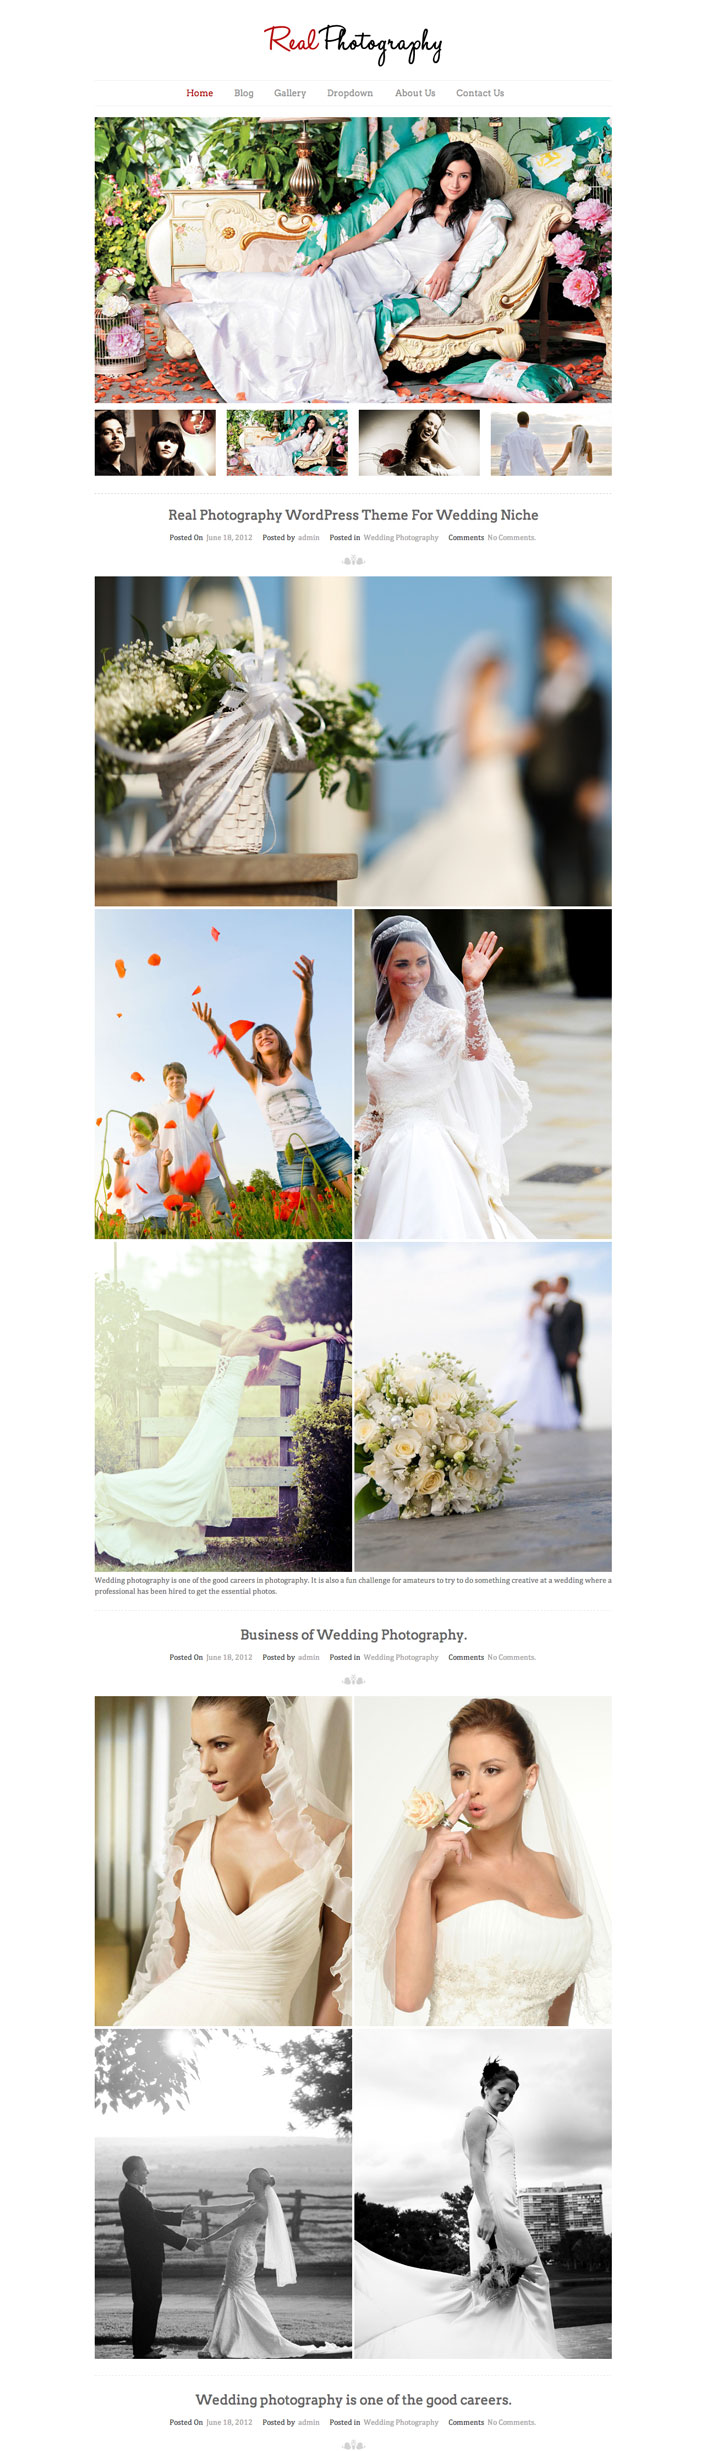 Real Photography WordPress Theme Portfolio Blog